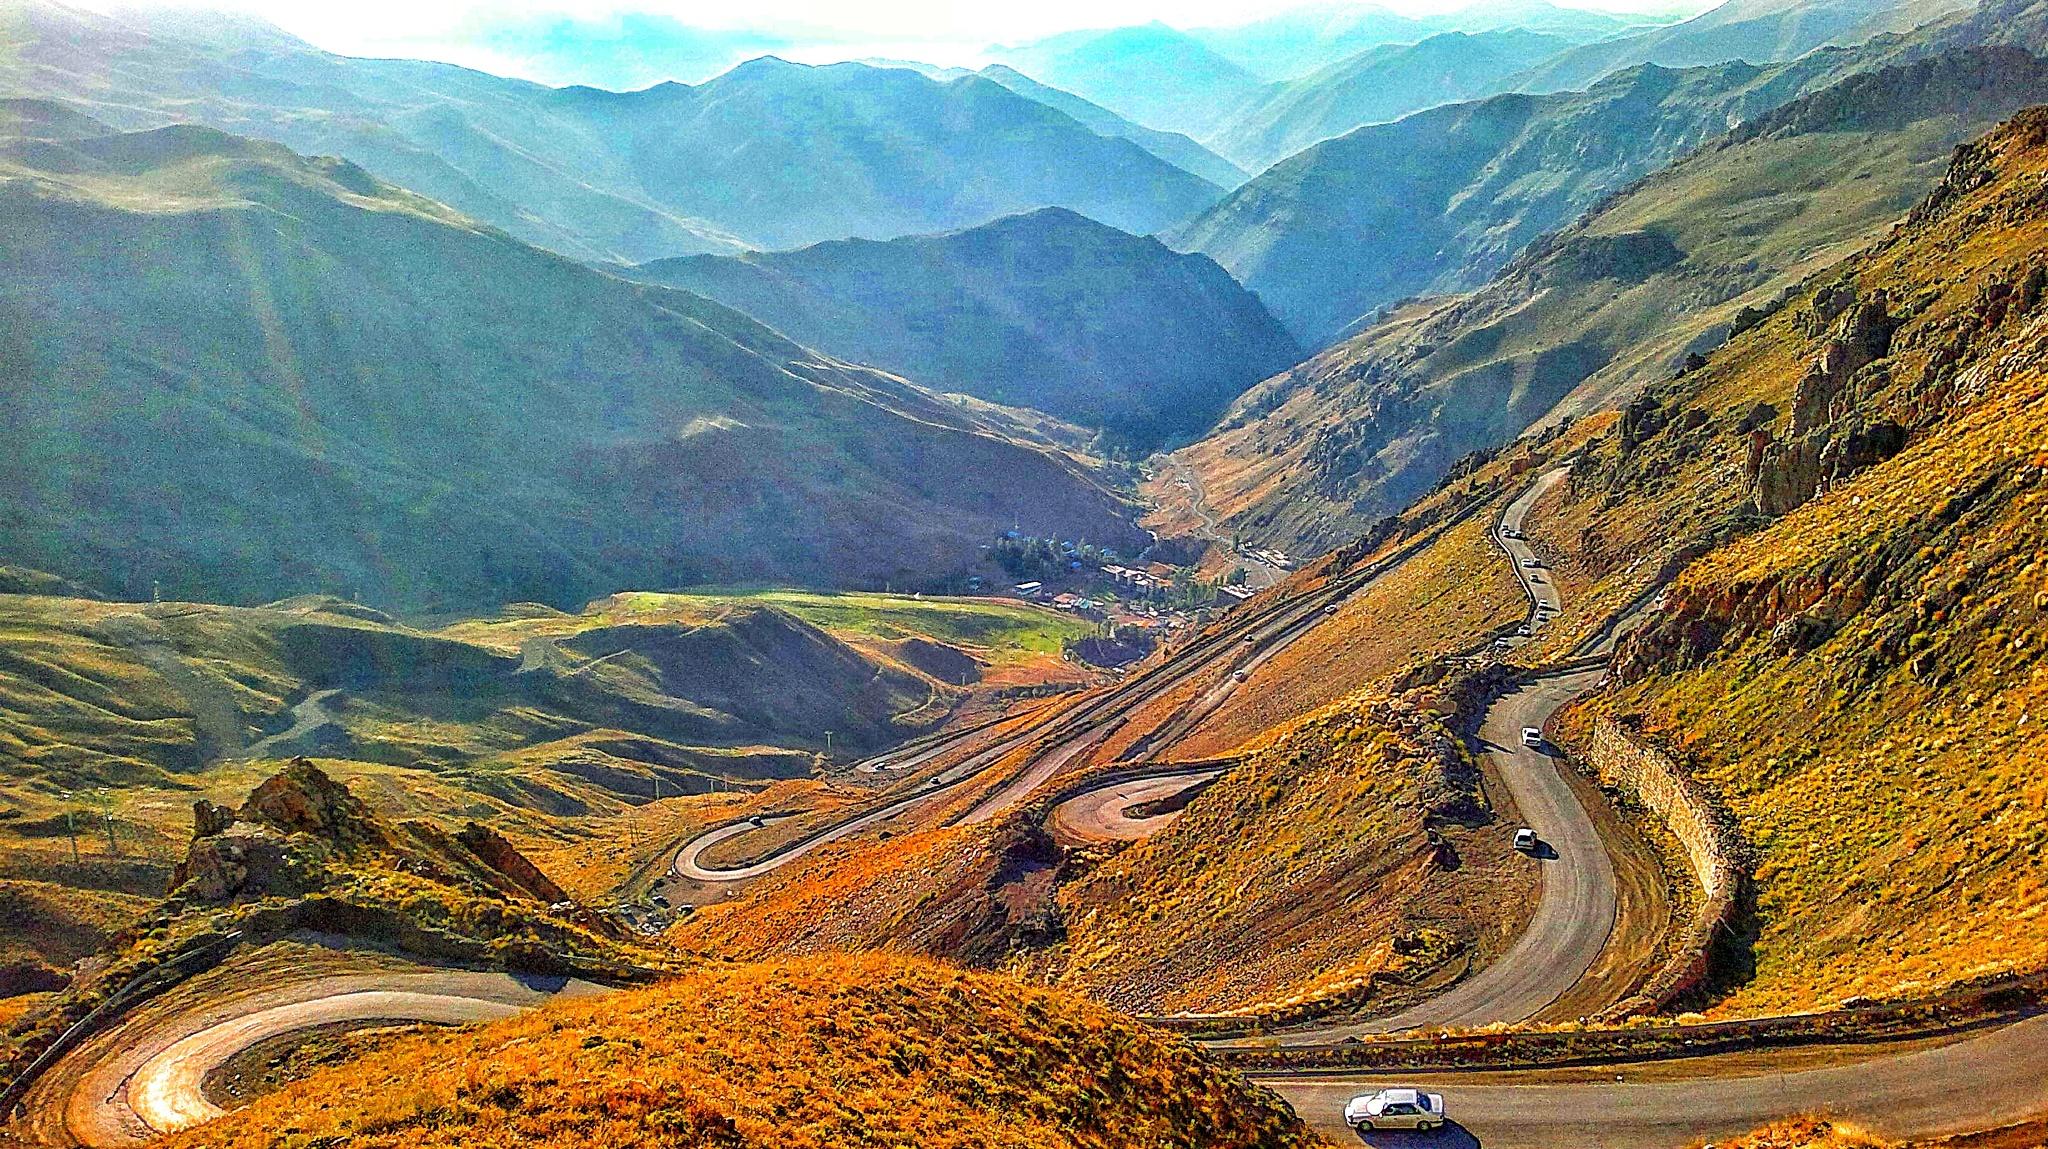 جاده  دیزین به شمشک  Road   Dizin, Shemshak by Ahmad Anvari